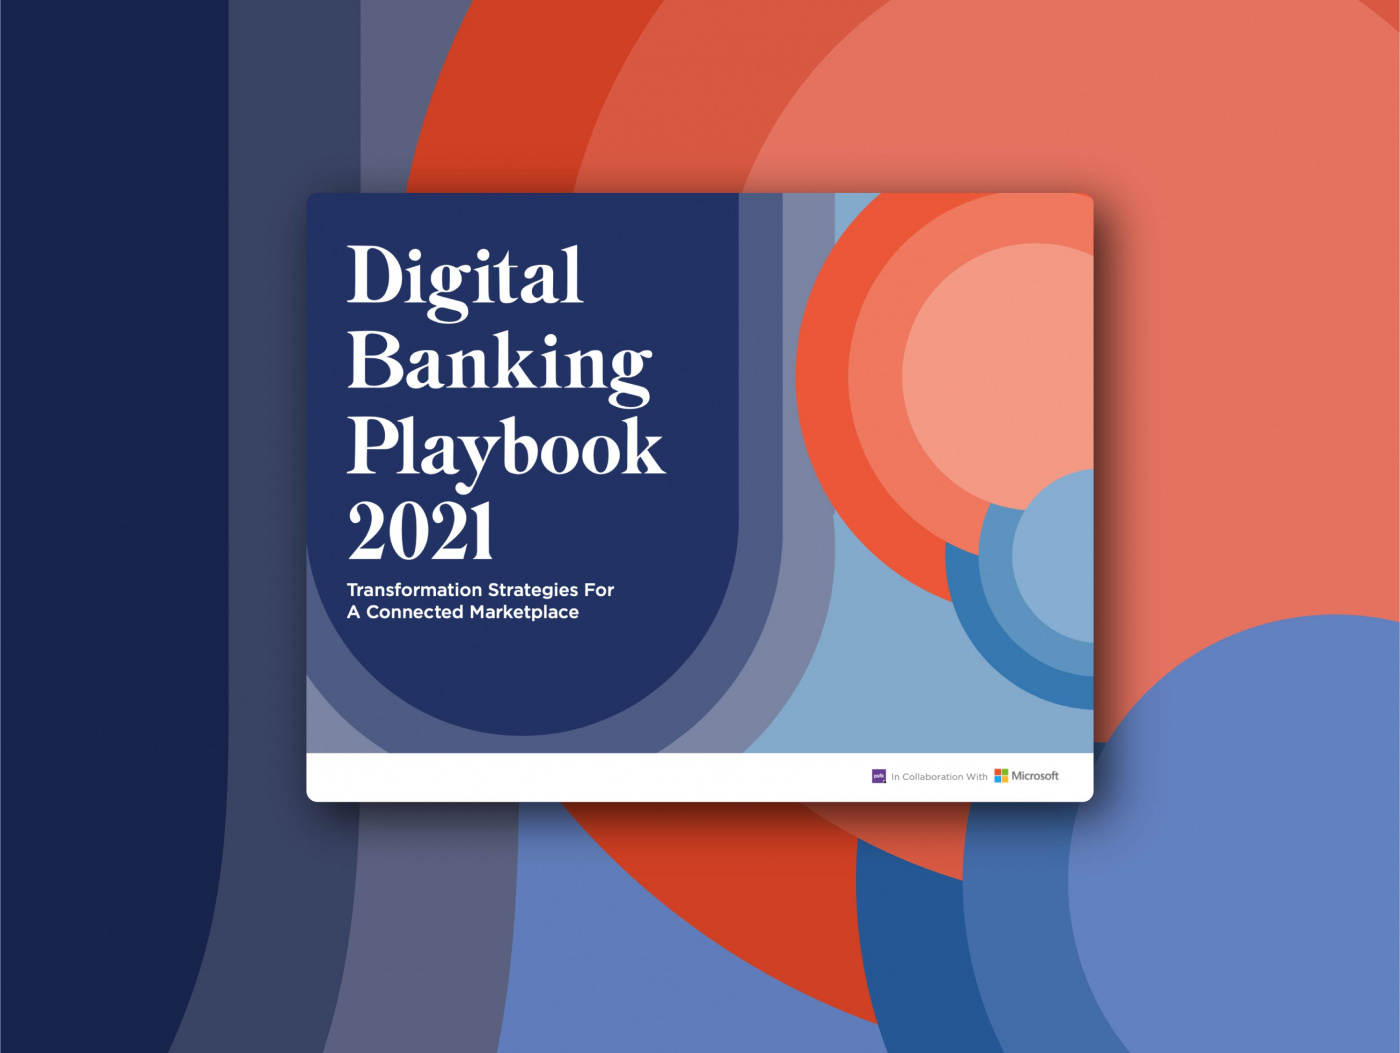 Digital Banking Playbook 2021